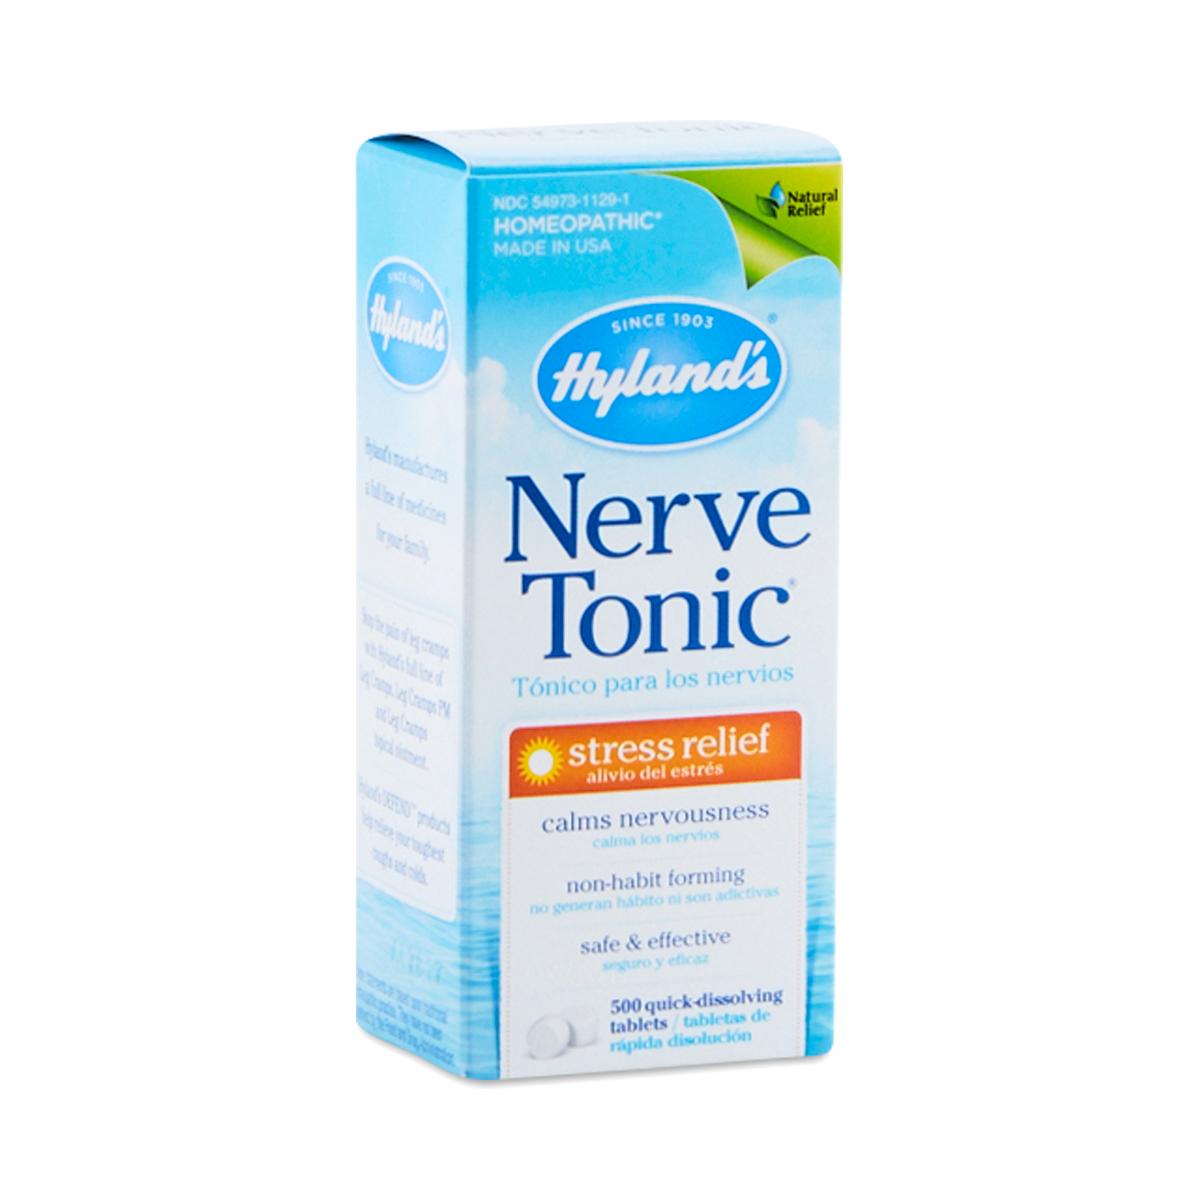 Hylands Nerve Tonic 500 tablets